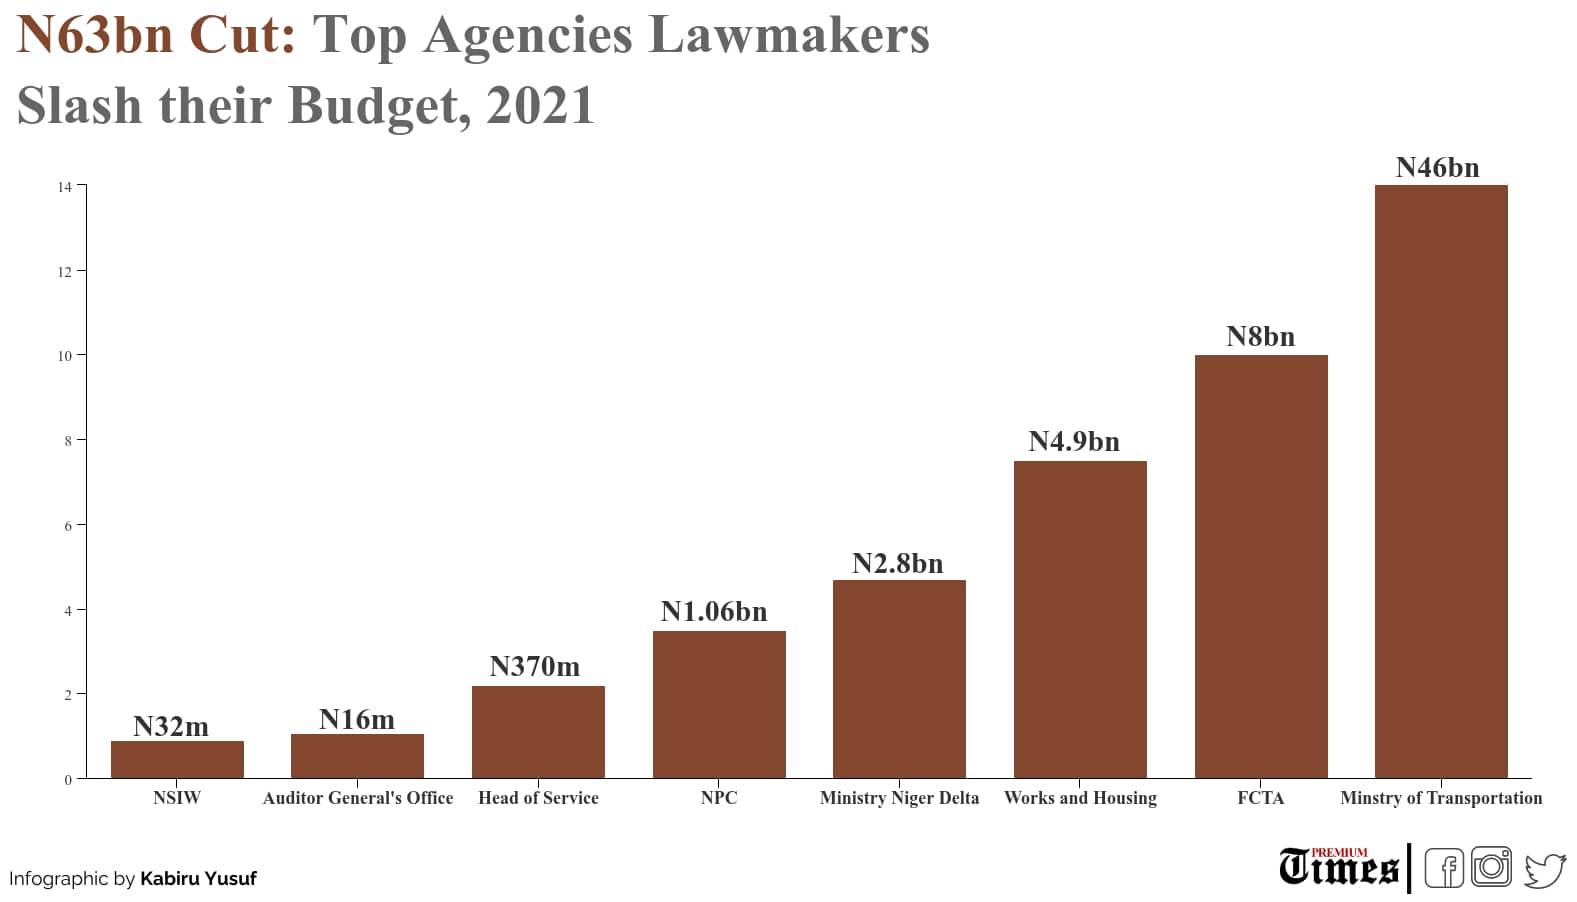 8 MDAs Lawmakers slash their budget